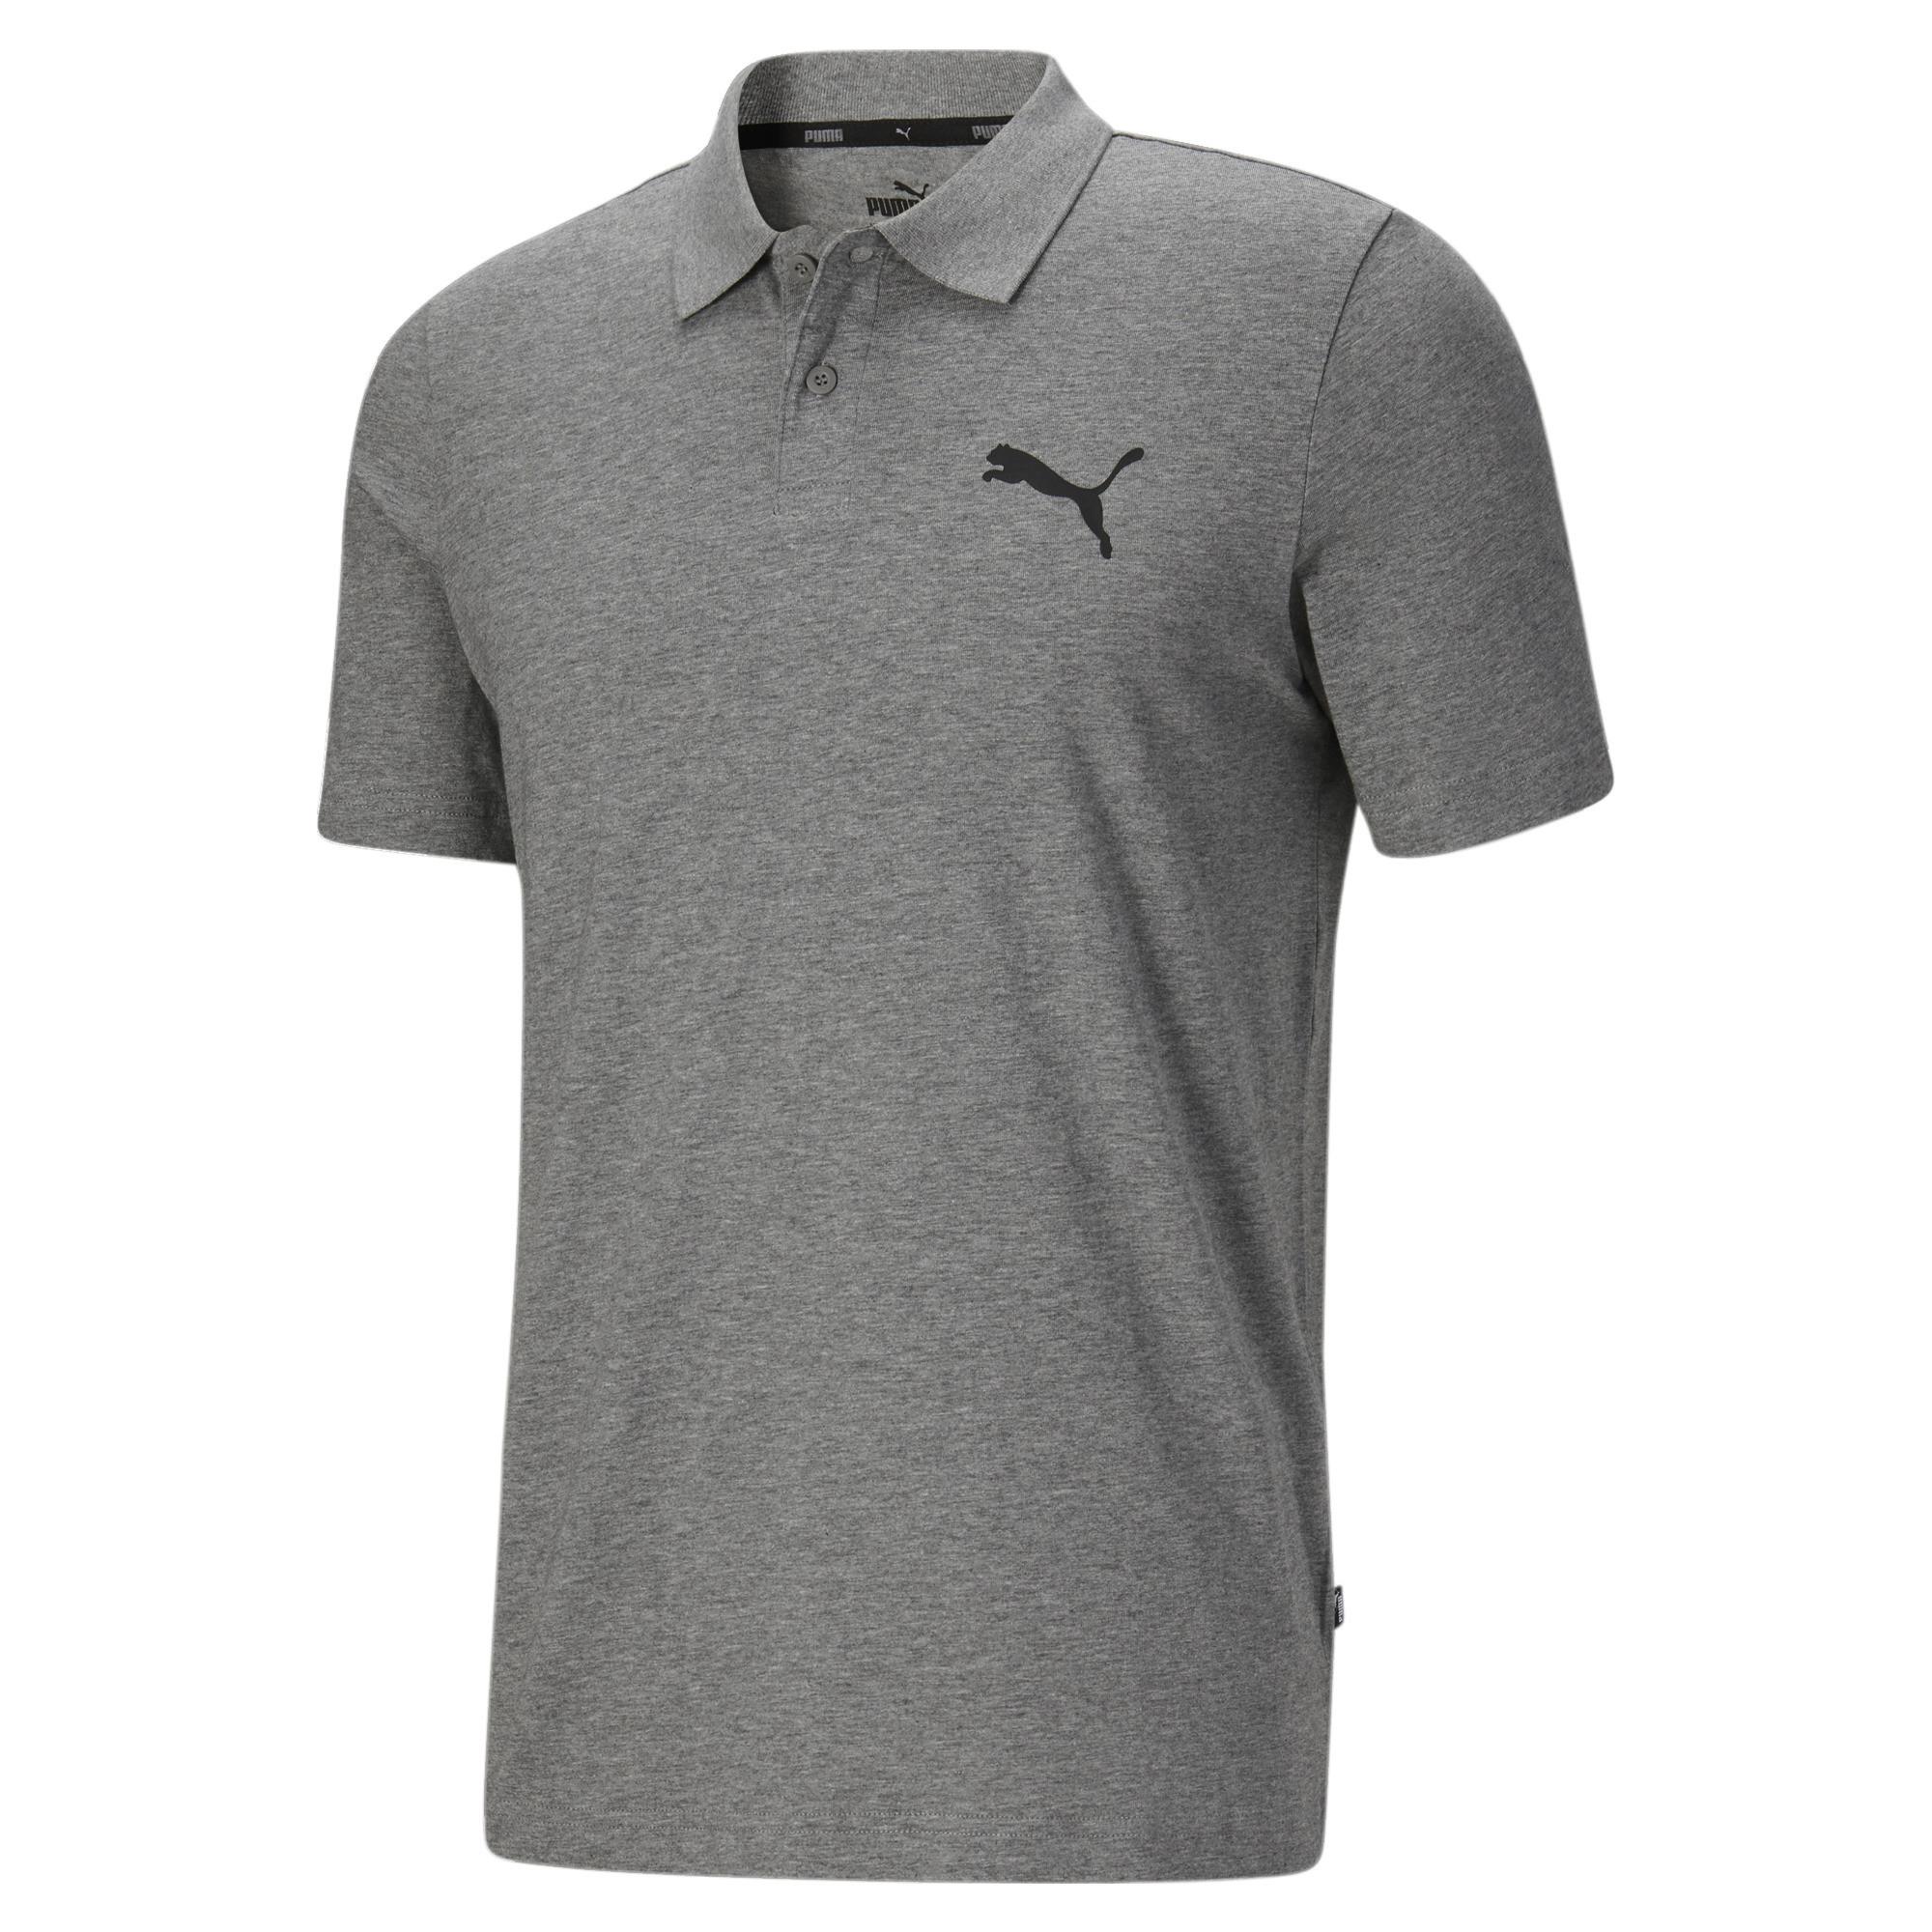 thumbnail 8 - PUMA Men's Essentials Jersey Polo